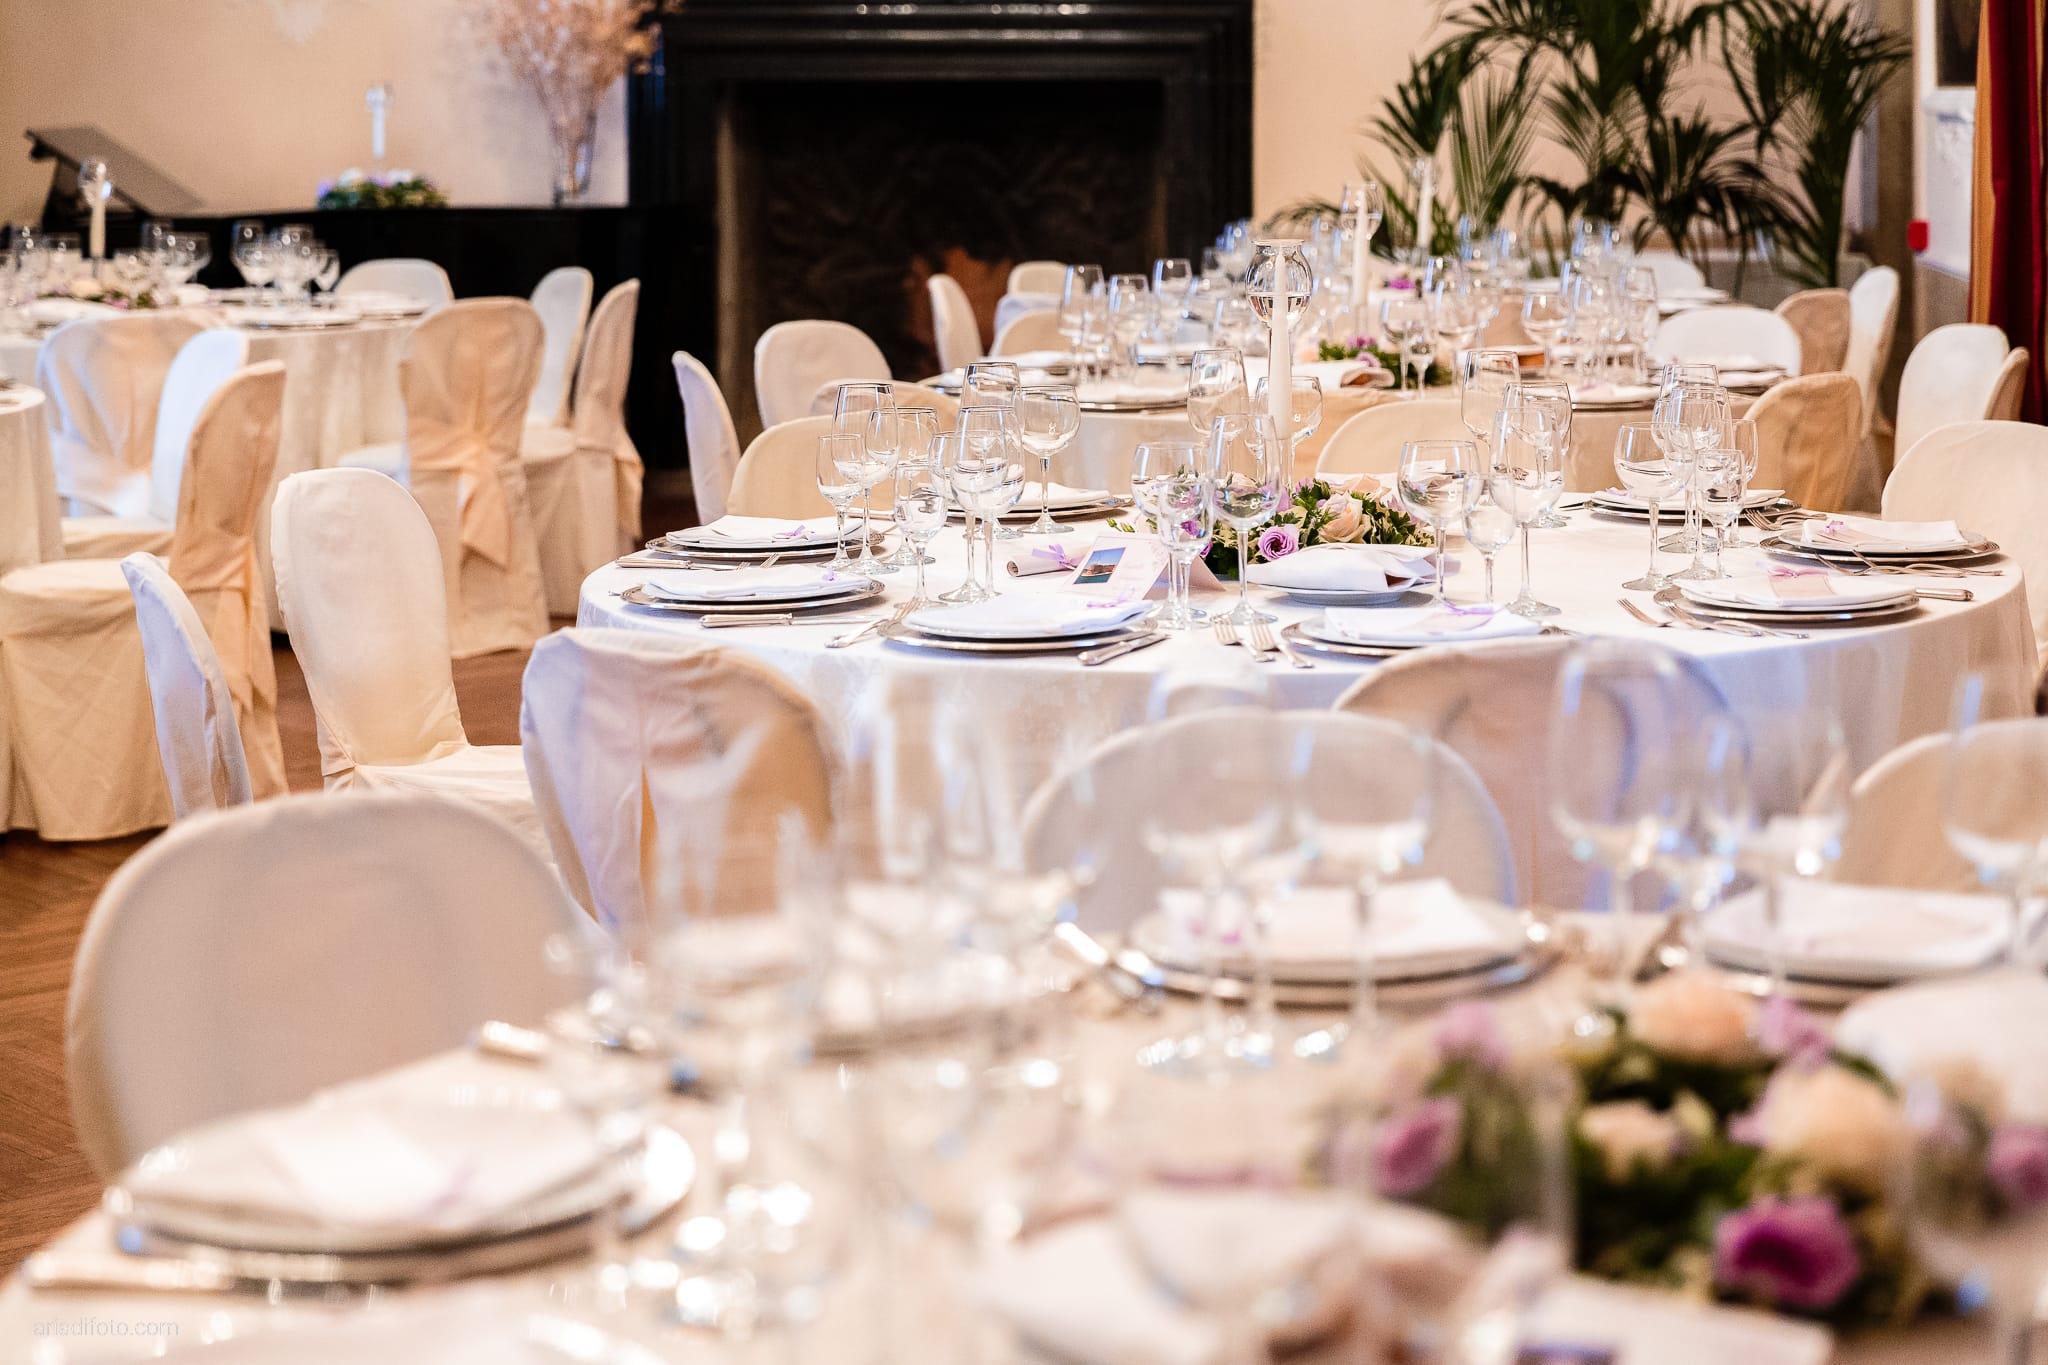 Donatella Enrico matrimonio Castello Duino Trieste ricevimento dettagli location allestimento tavoli